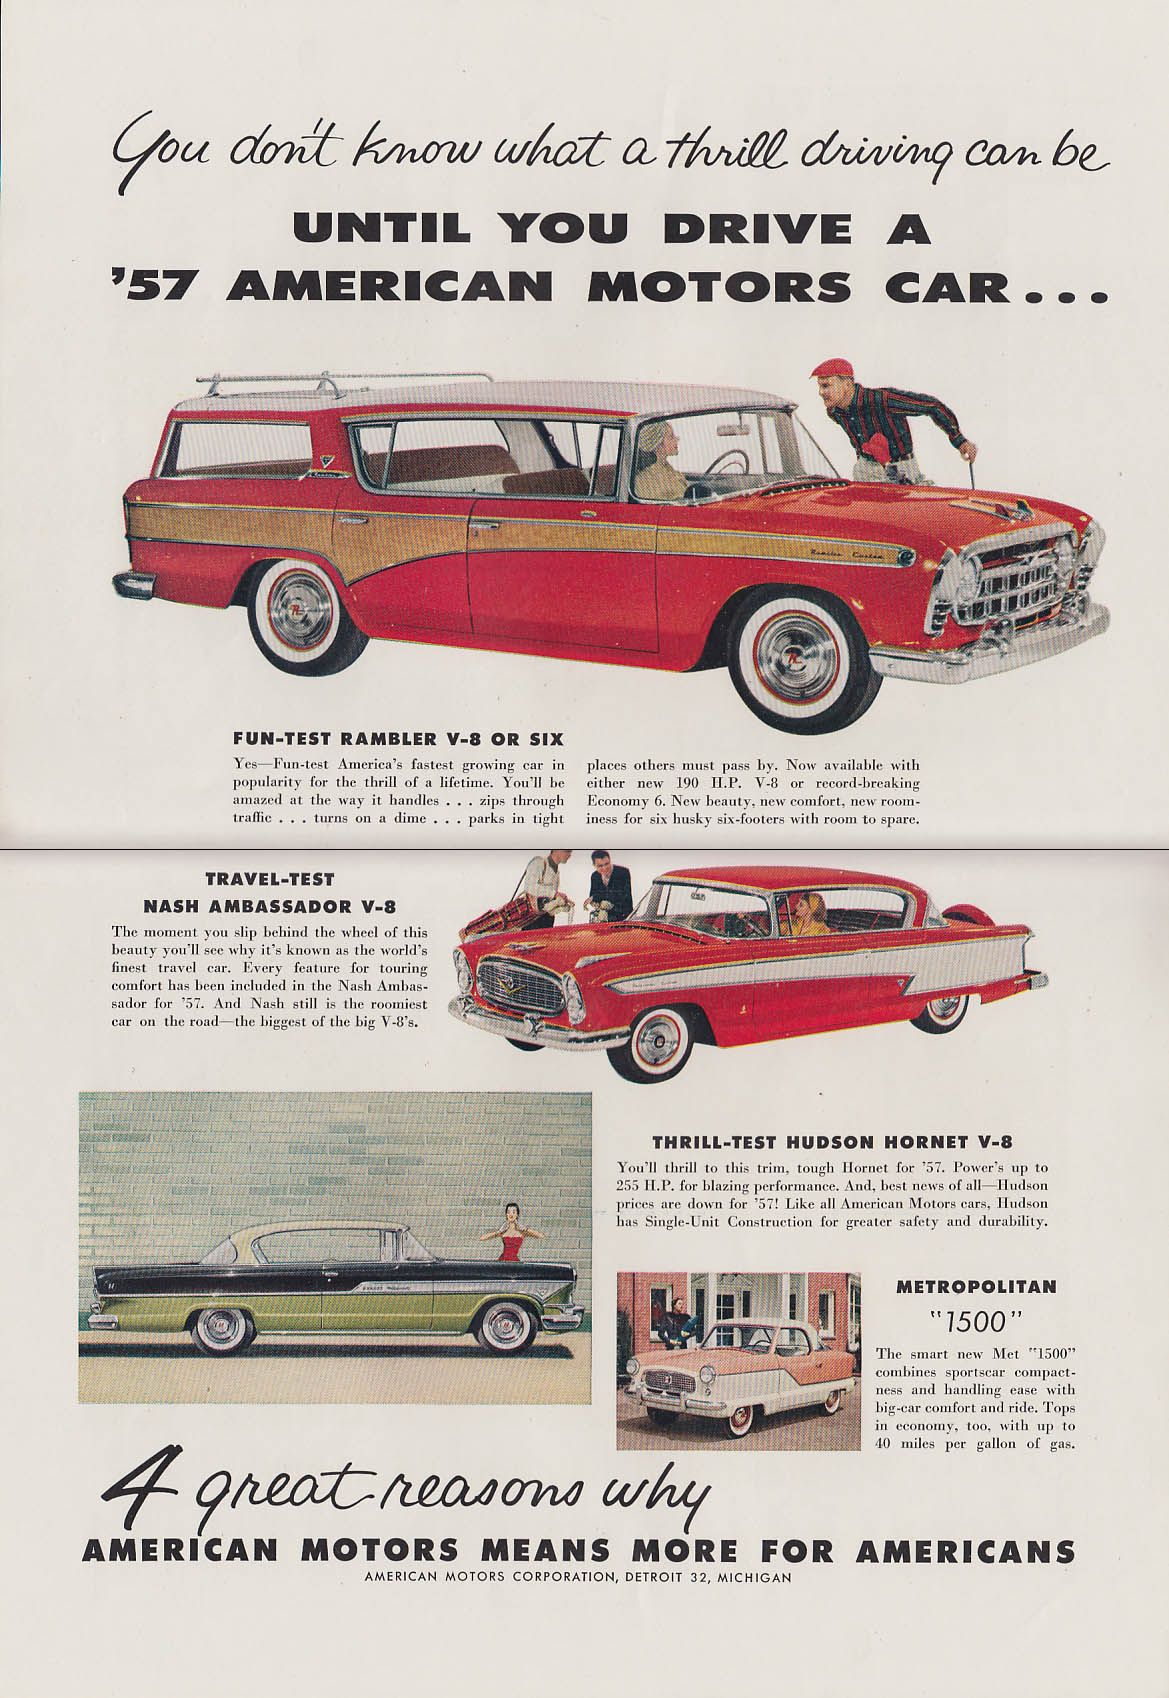 American Motors Rambler Nash Ambassador Hudson Hornet Metropolitan 1500 ad 1957